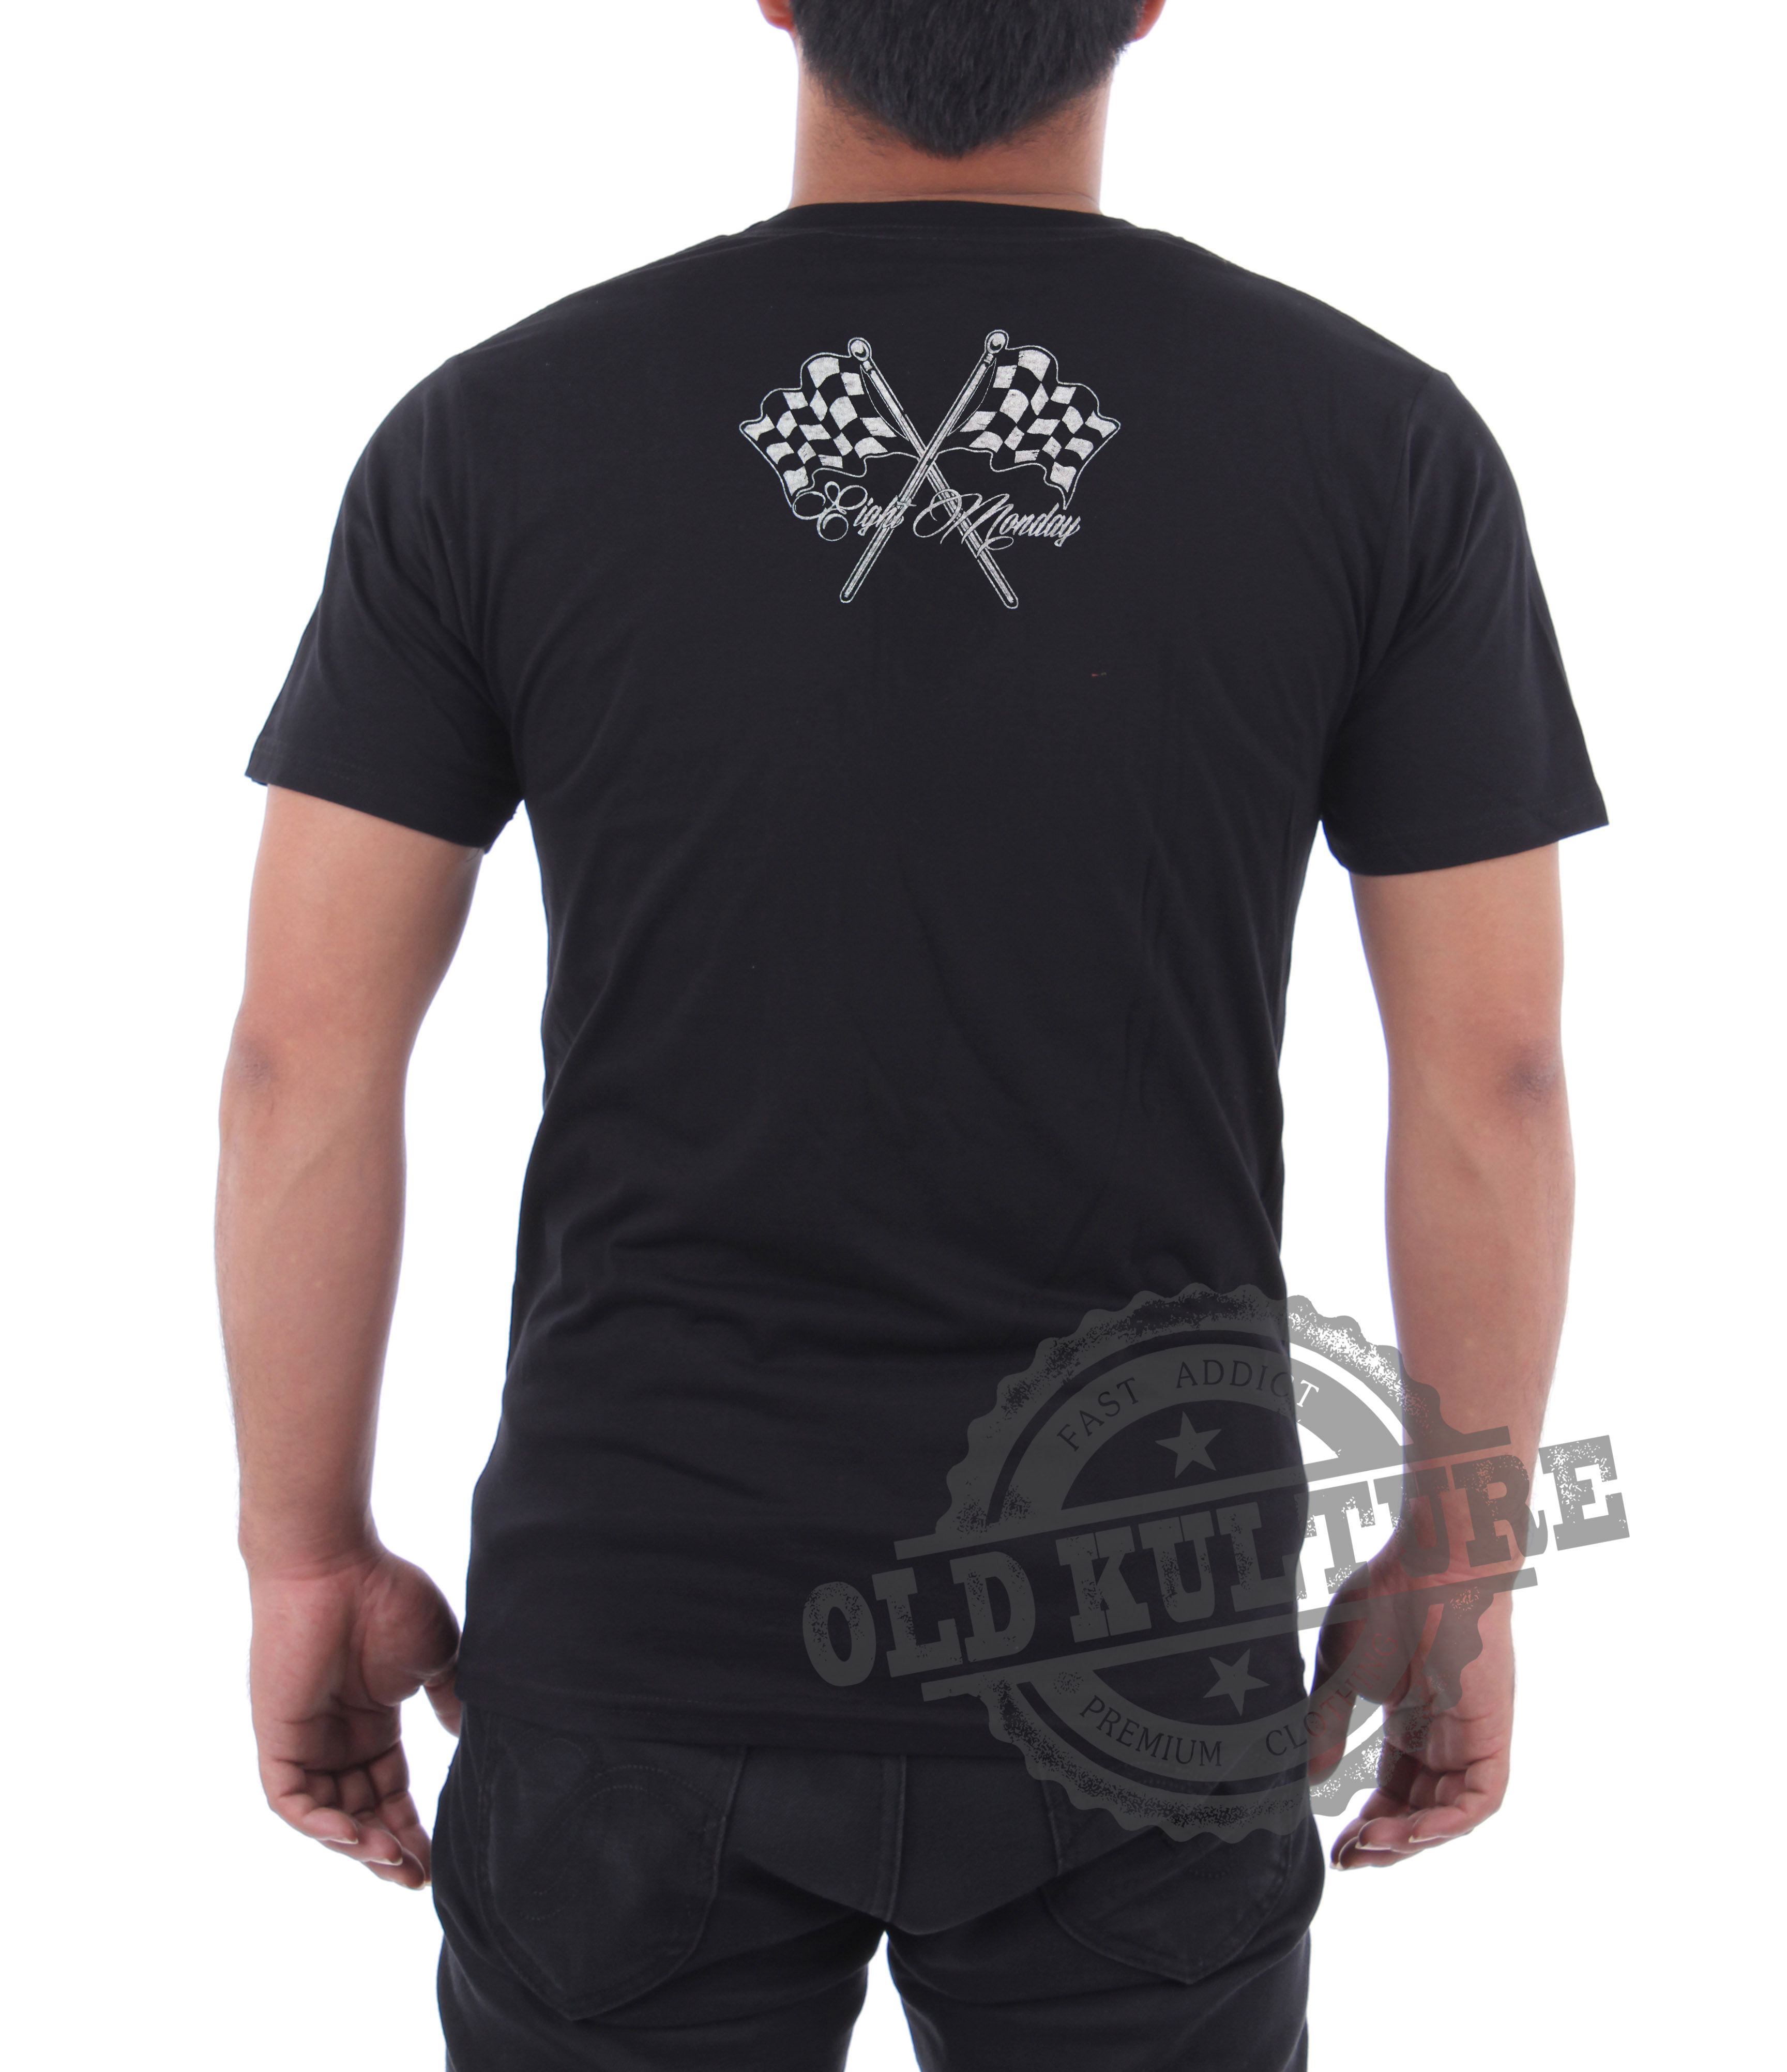 eight_monday_rockabilly_mens_t_shirt_born_to_ride_custom_hot_rod_em20_t_shirts_3.jpg